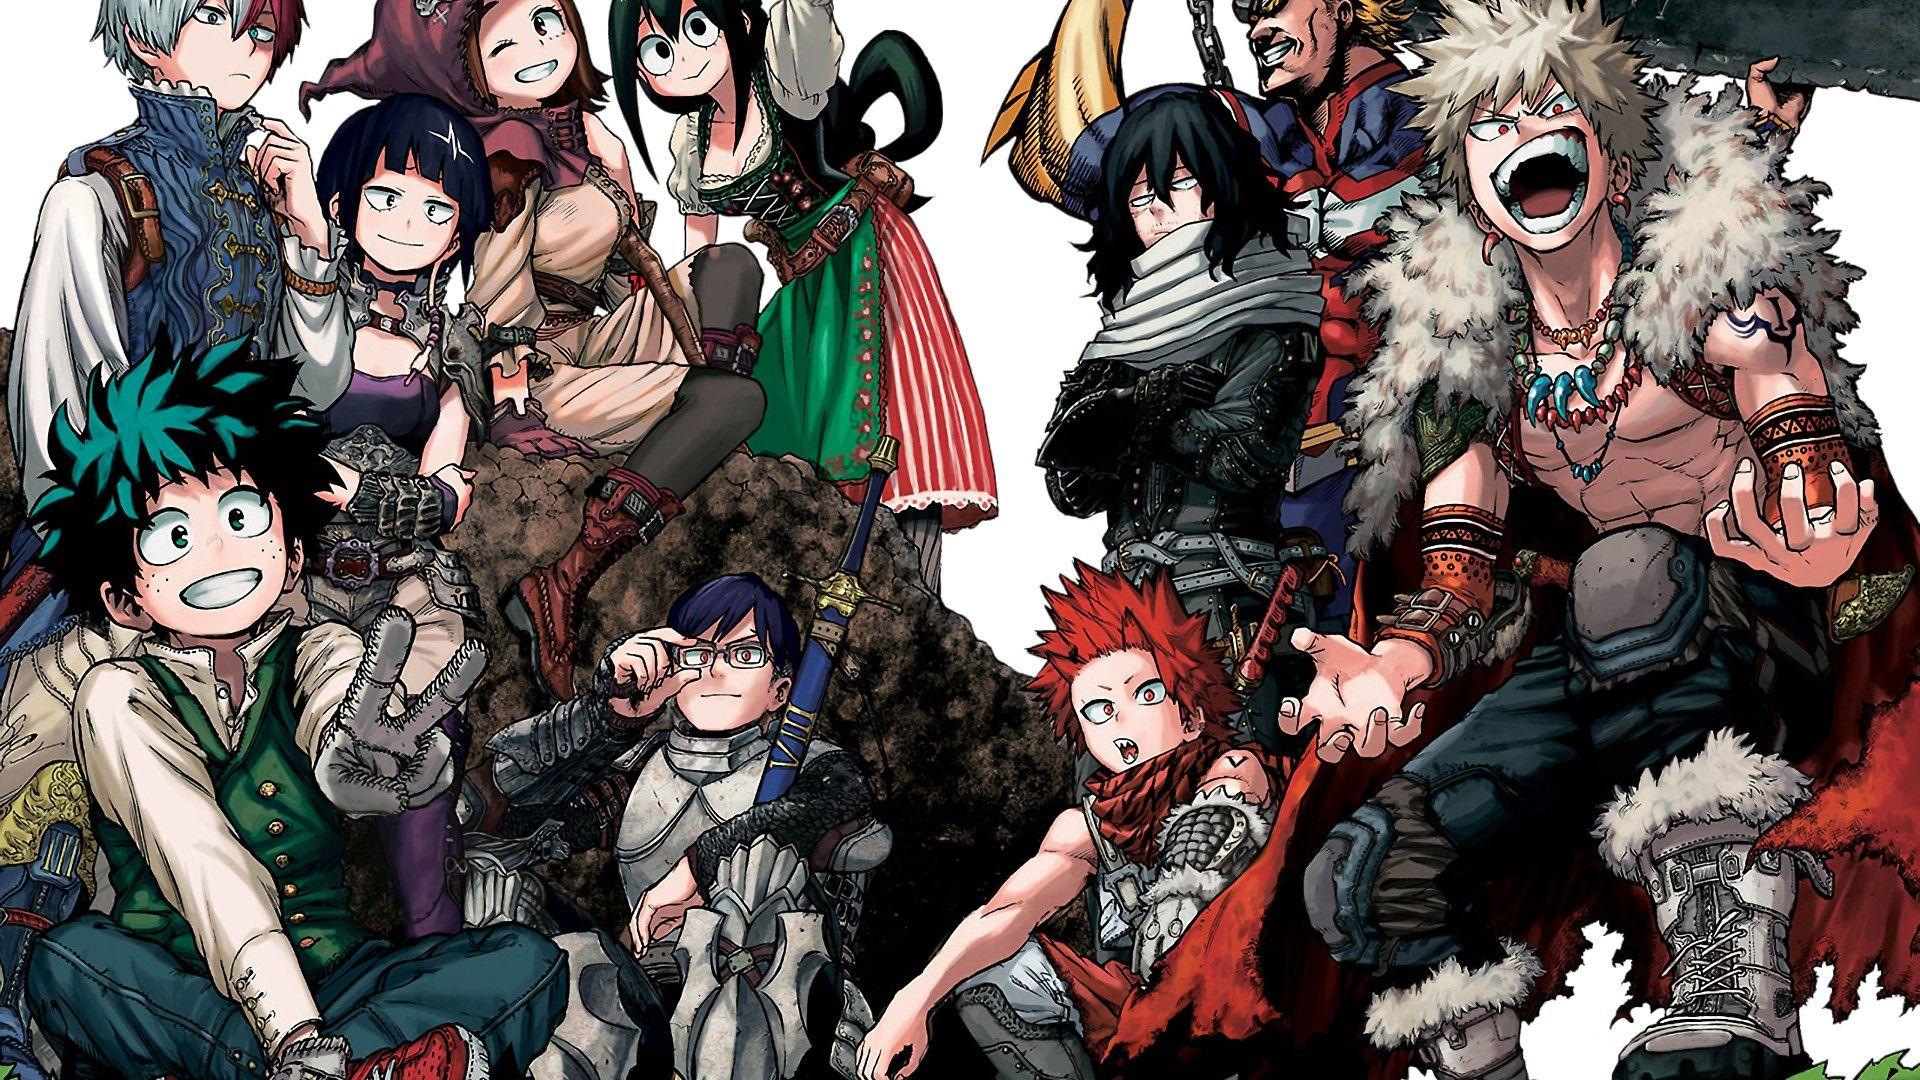 My Hero Academia Poster Hd Wallpaper Best Movie Poster Wallpaper Hd Anime Anak Laki Laki Anak Laki Laki Anak